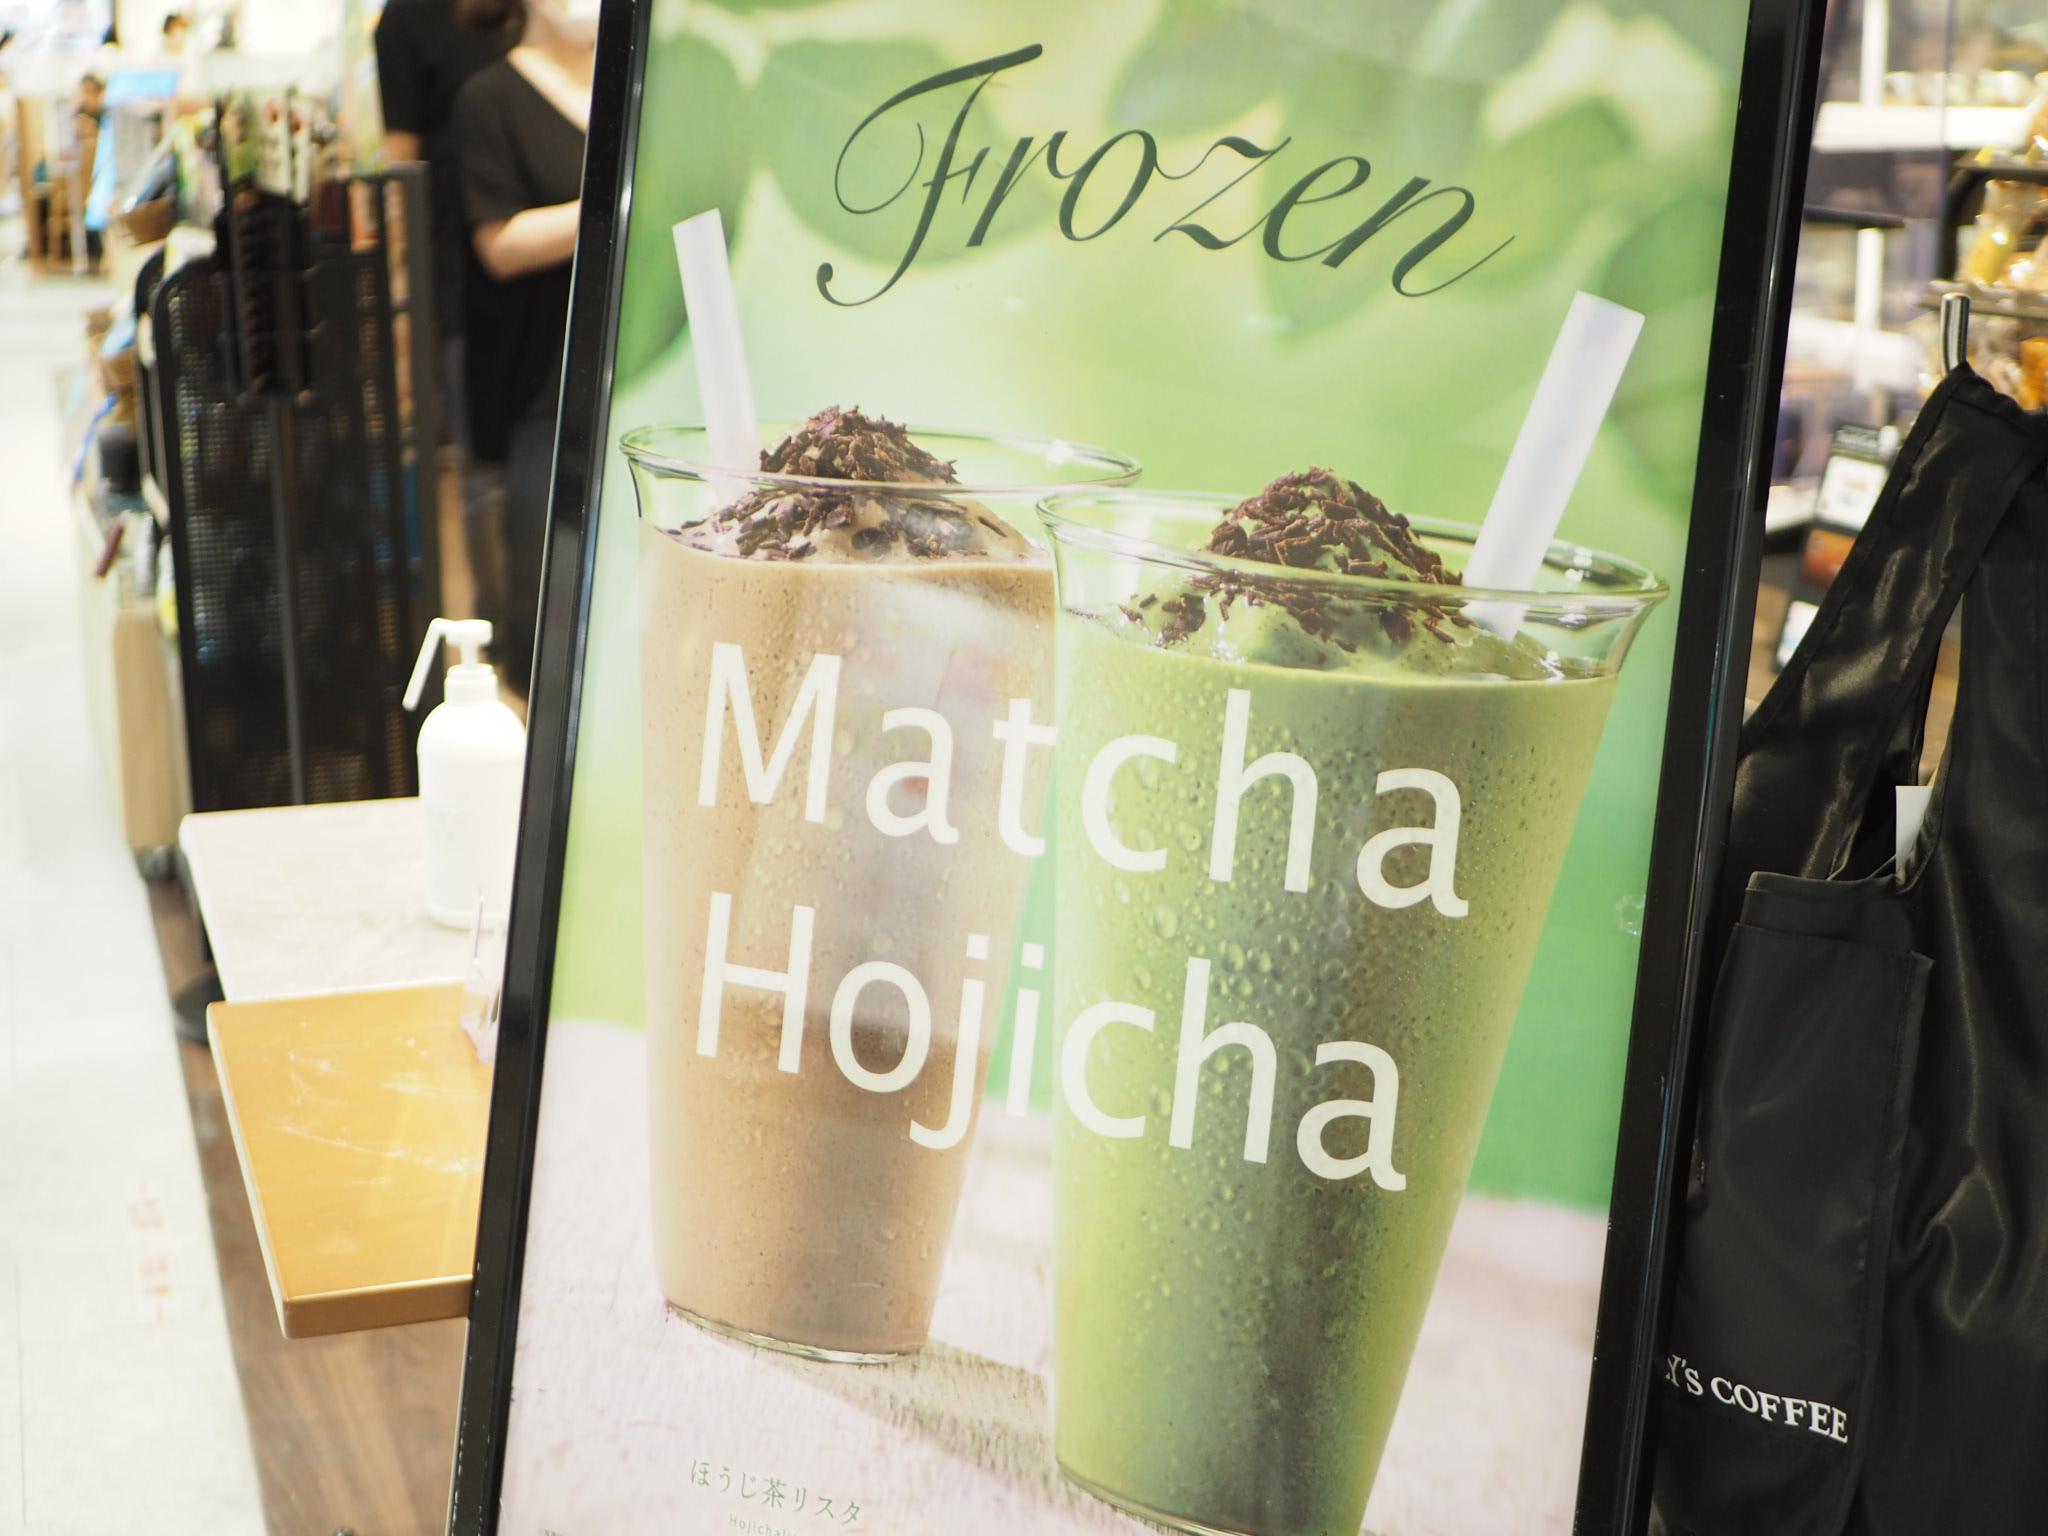 【TULLY'S COFFEE】濃厚フローズンドリンク「抹茶リスタ」&「ほうじ茶リスタ」が待望のレギュラーメニューに❤︎_1